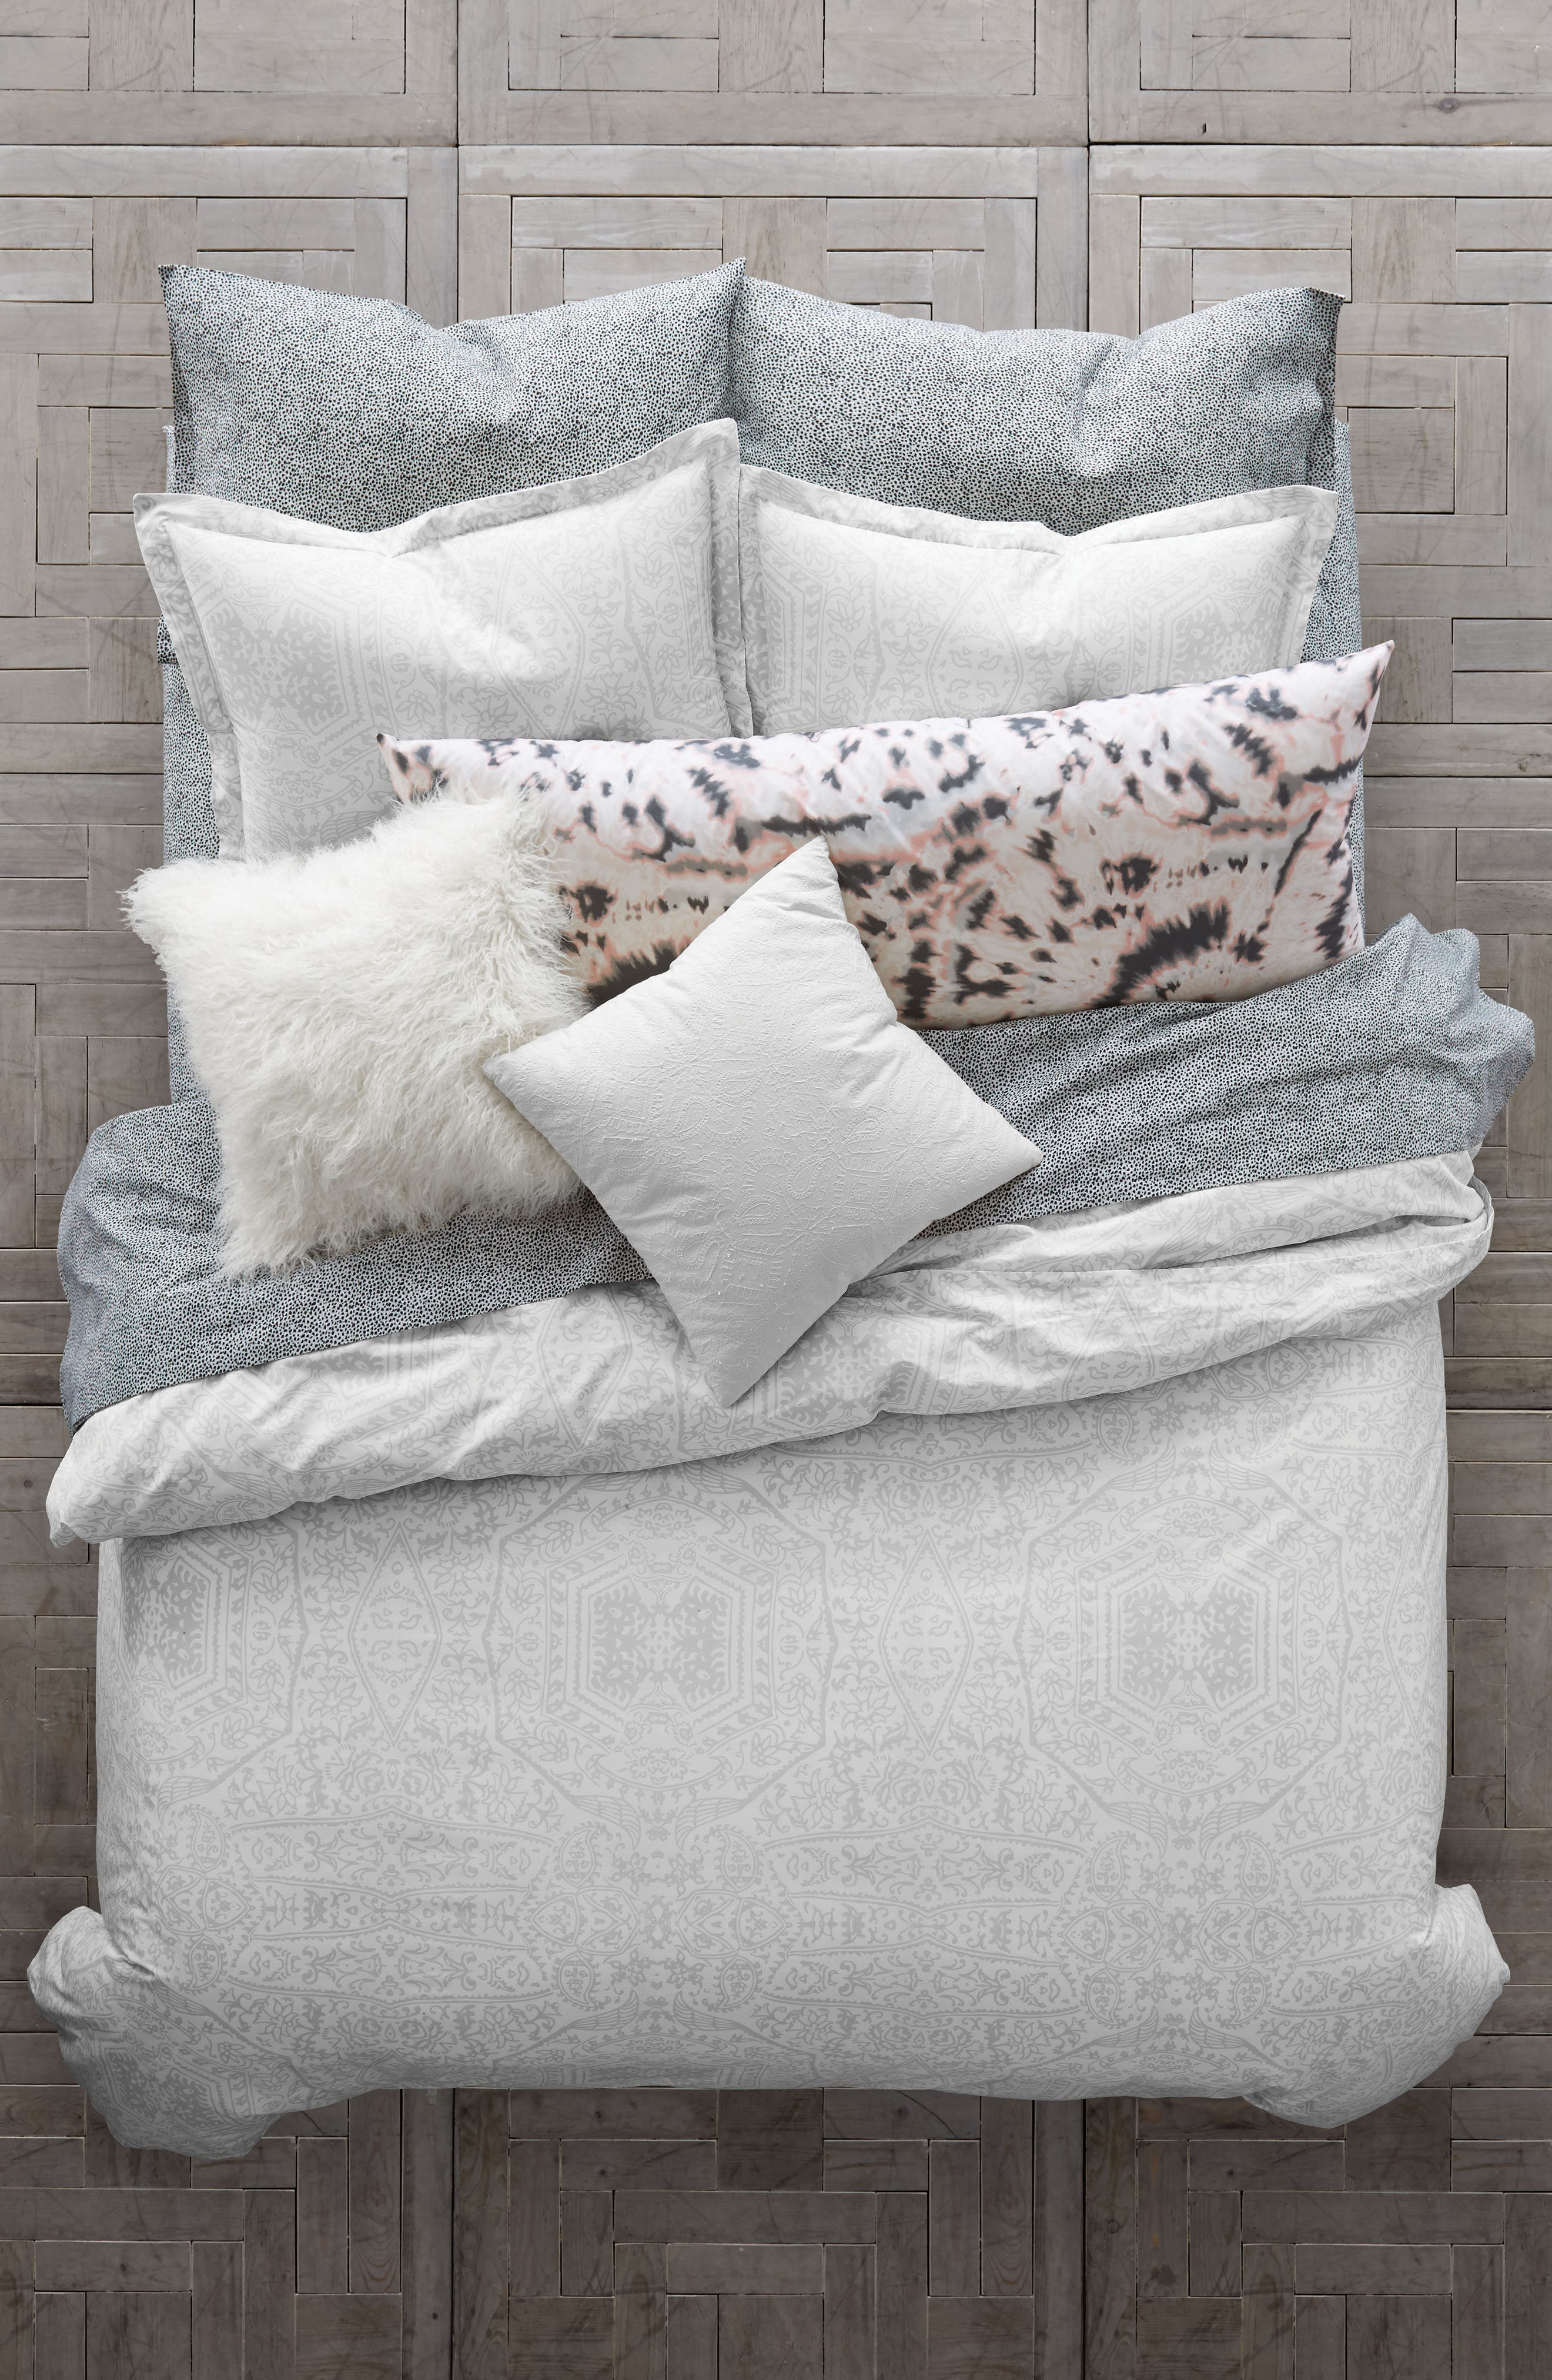 Chantilly Lace Comforter & Sham Set,                             Main thumbnail 1, color,                             100